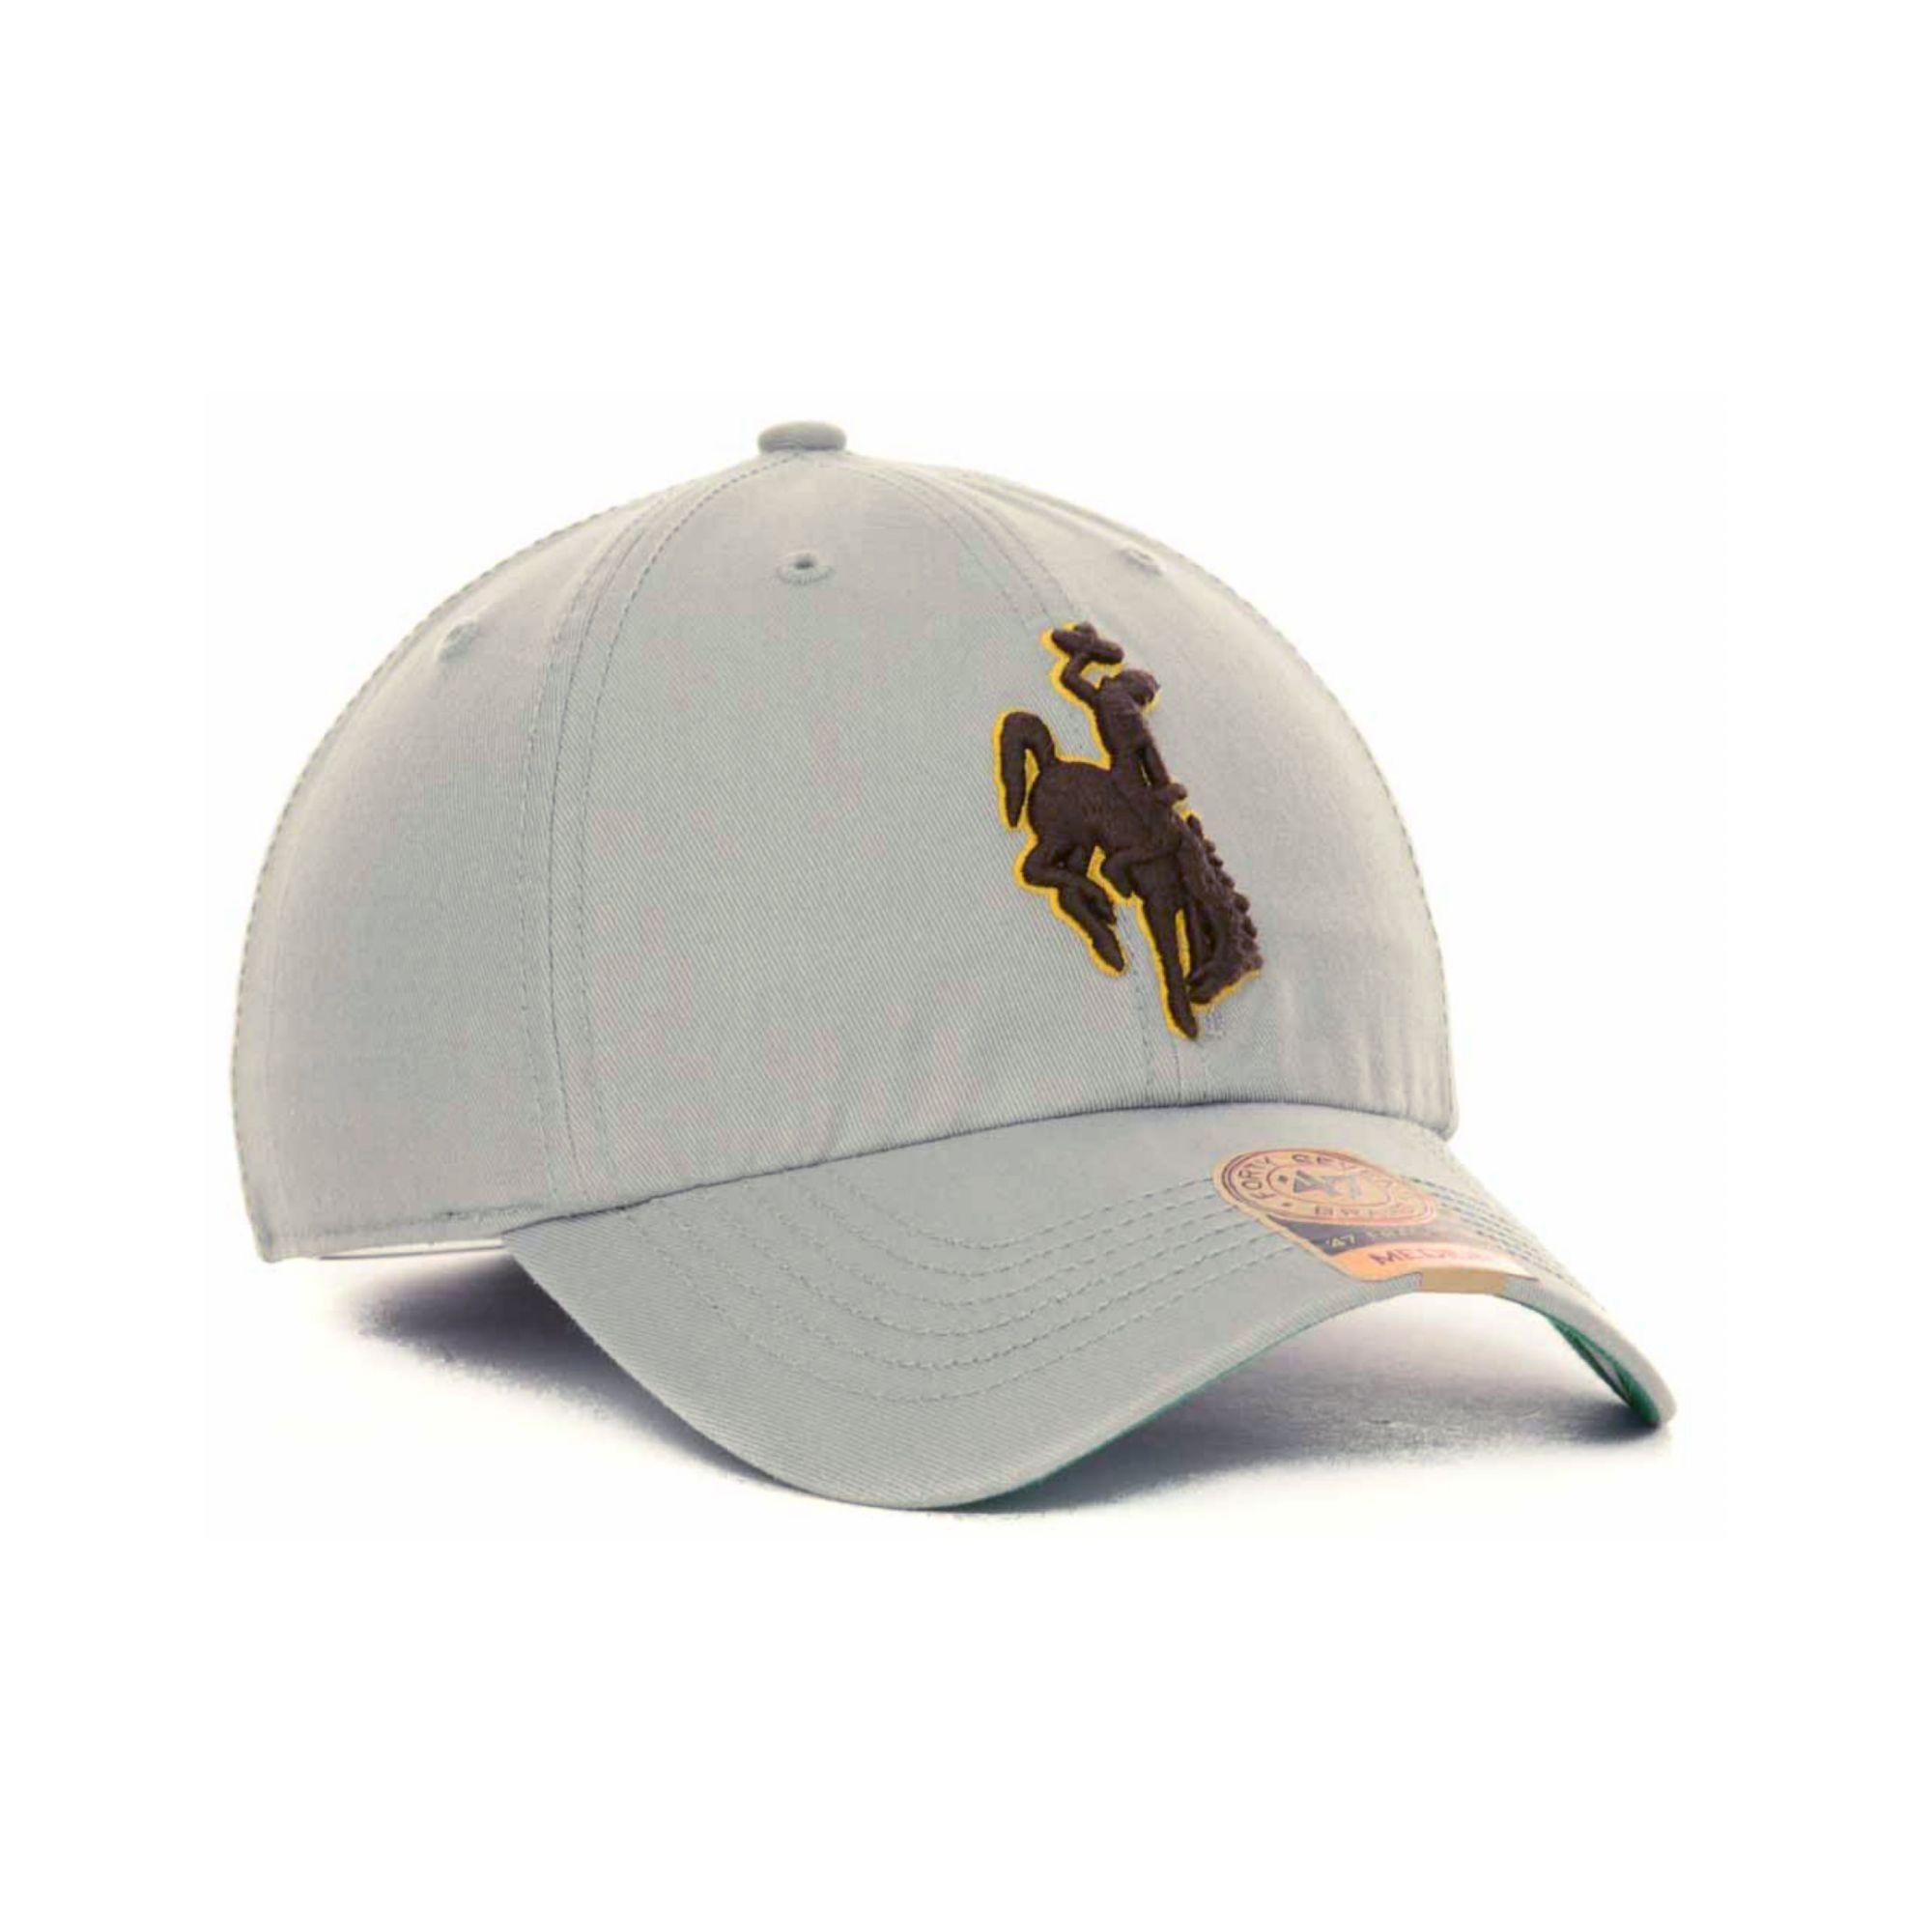 47 Brand Gray Wyoming Cowboys Ncaa 47 Grey Franchise Cap for men